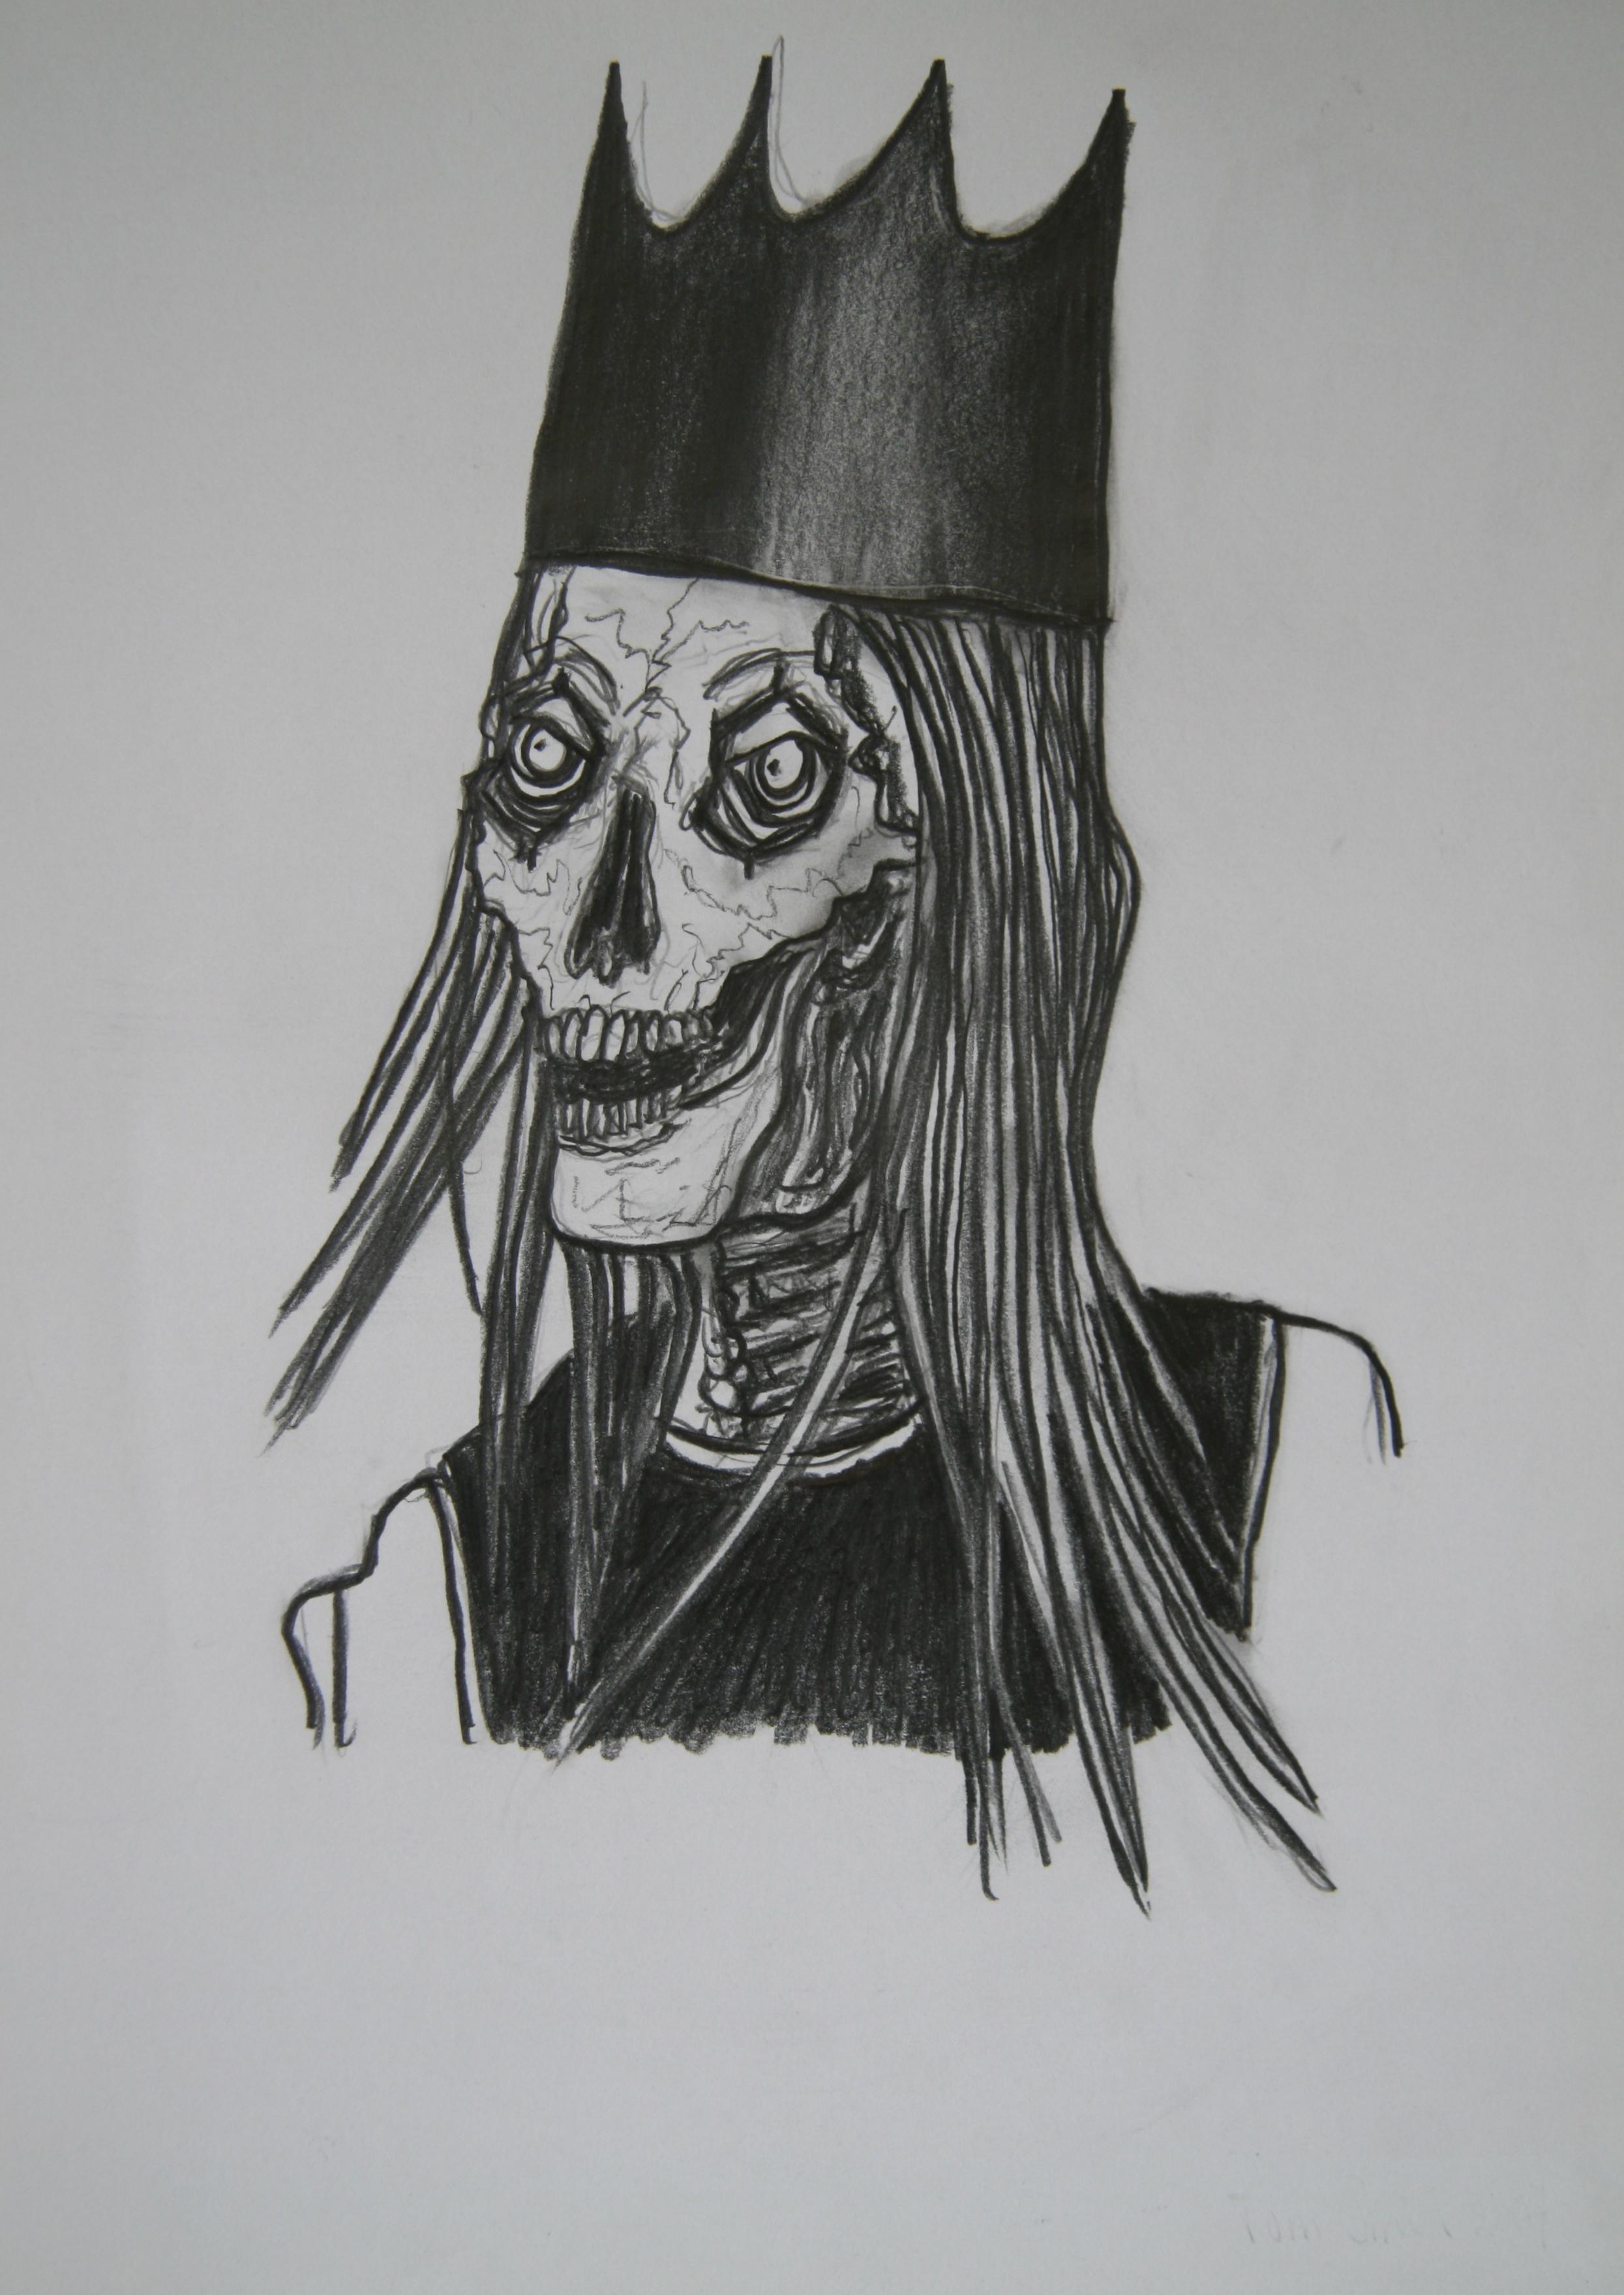 Skull 9, 30x21cm, pencil on paper